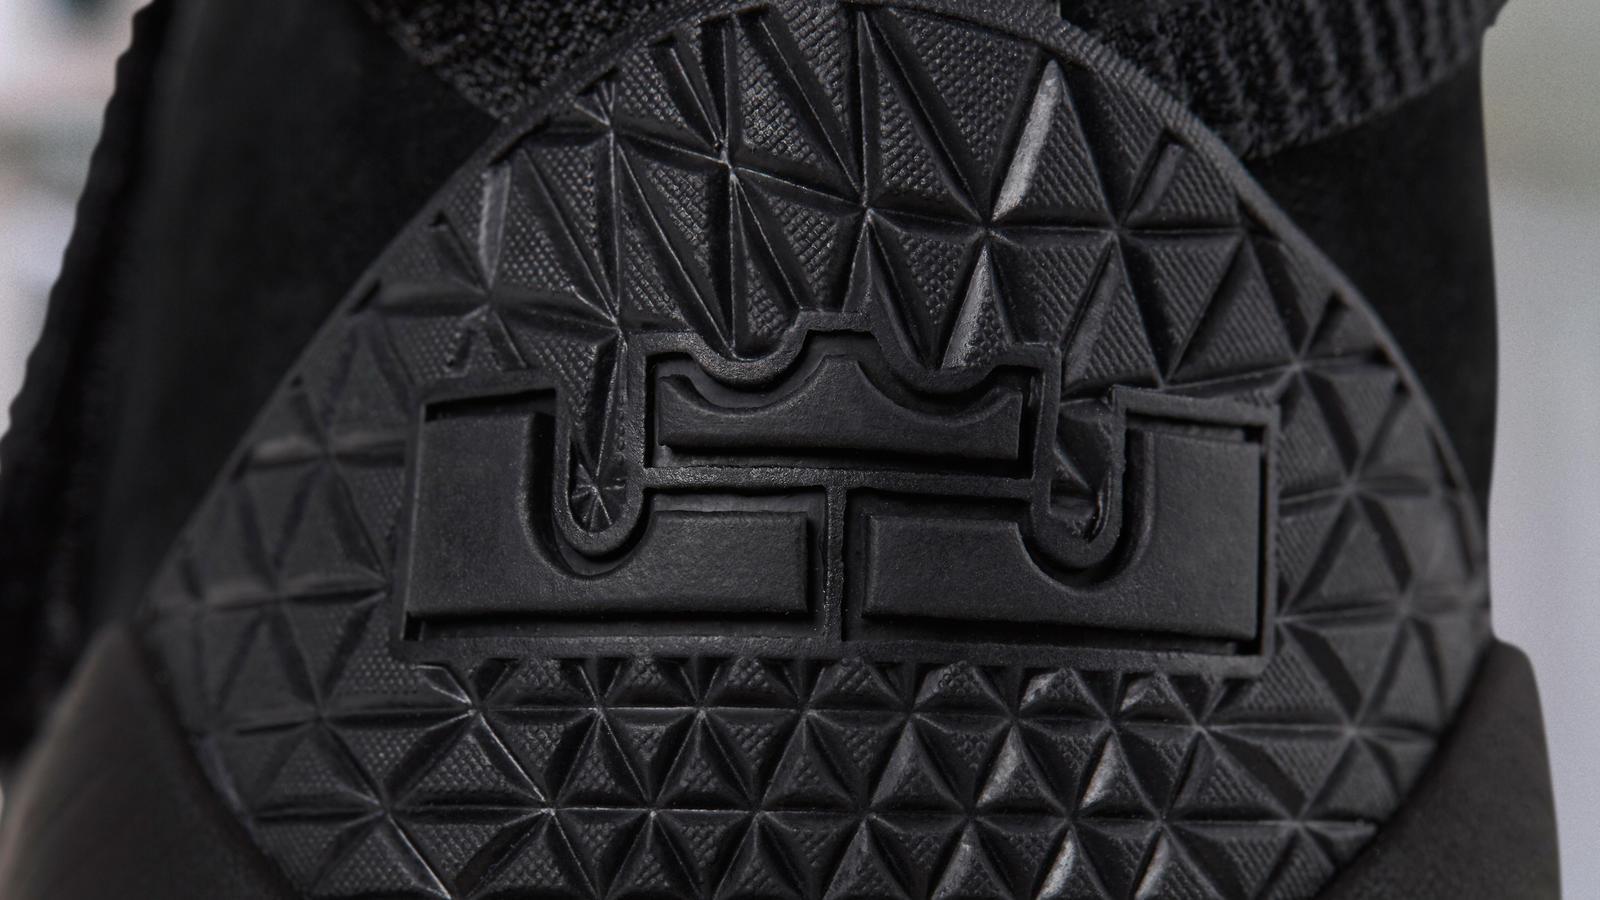 d8cad8936b1 Nike Lebron Soldier 11 XI protoype 897646-001 – Housakicks